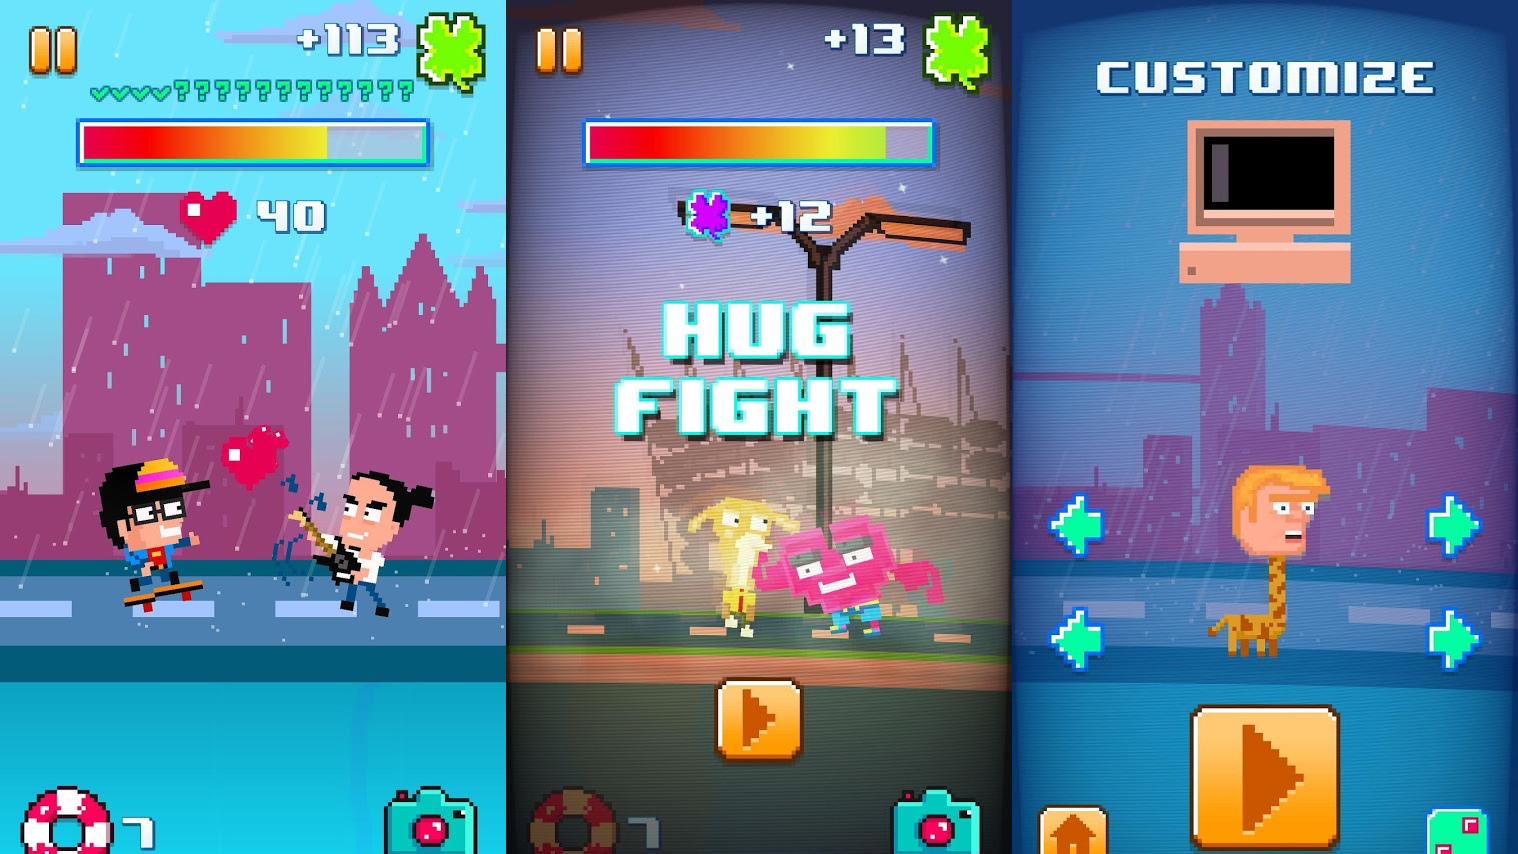 usqyHSHnuRJCUPVj3G99Sb - The best free Android games 2018